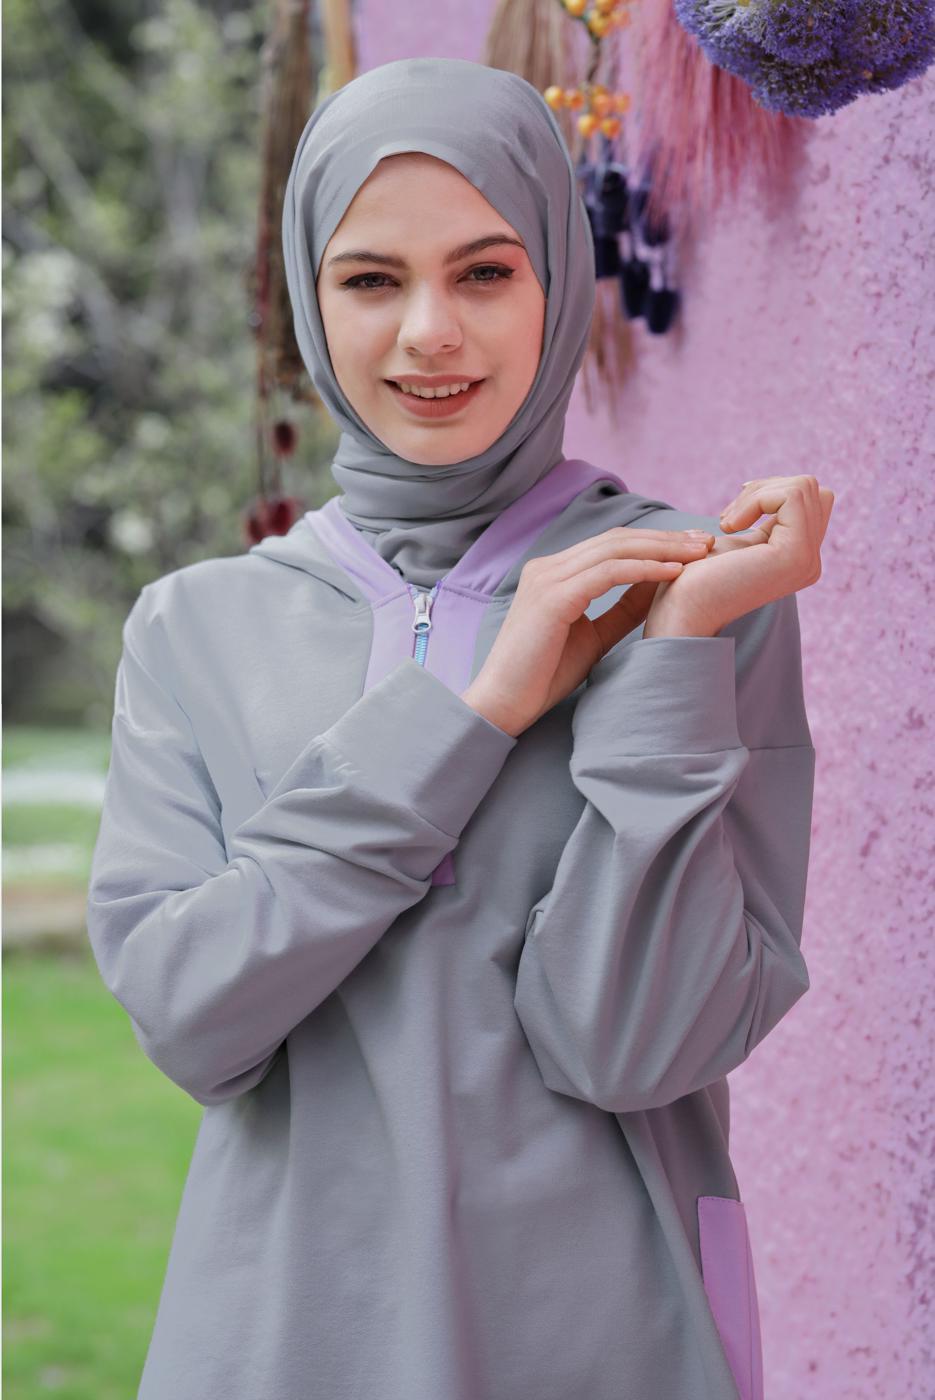 Bayan GRİ FERMUARLI KAPÜŞONLU TUNİK  63012